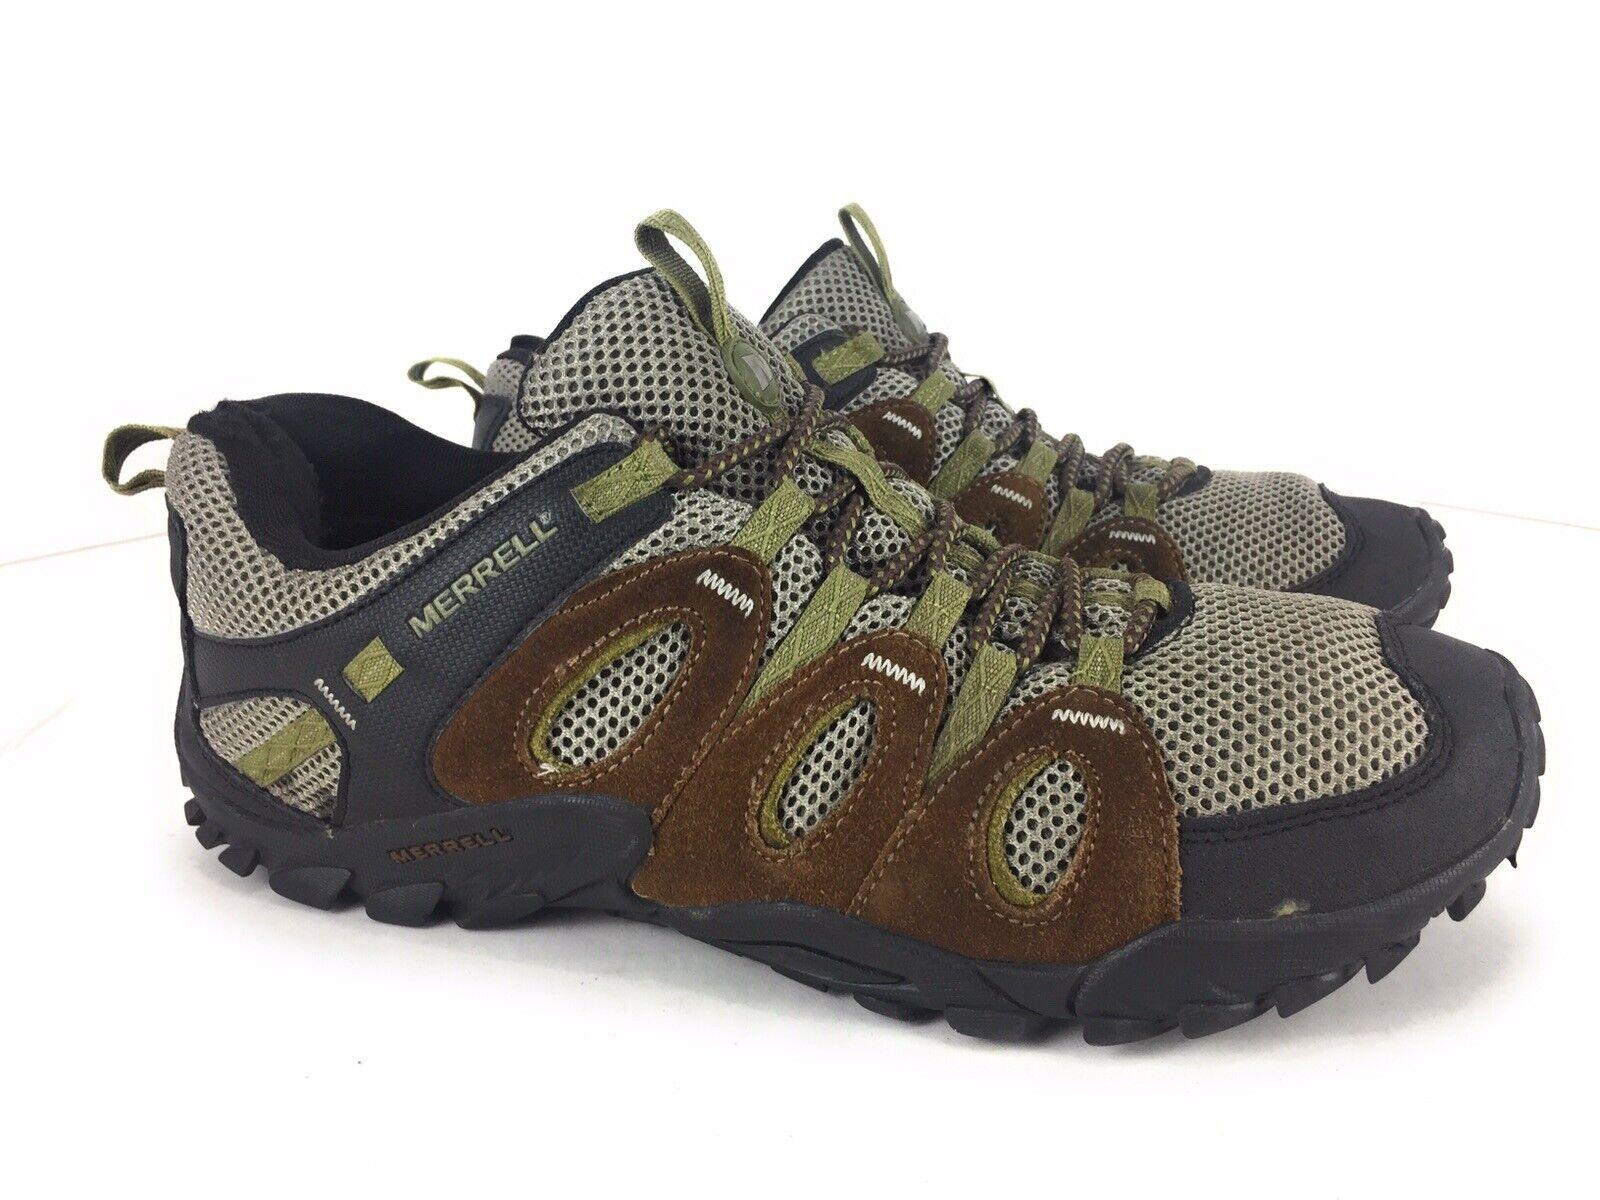 Merrell Crosslander Vent Suede Hiking avvio Dimensione 10.5 US